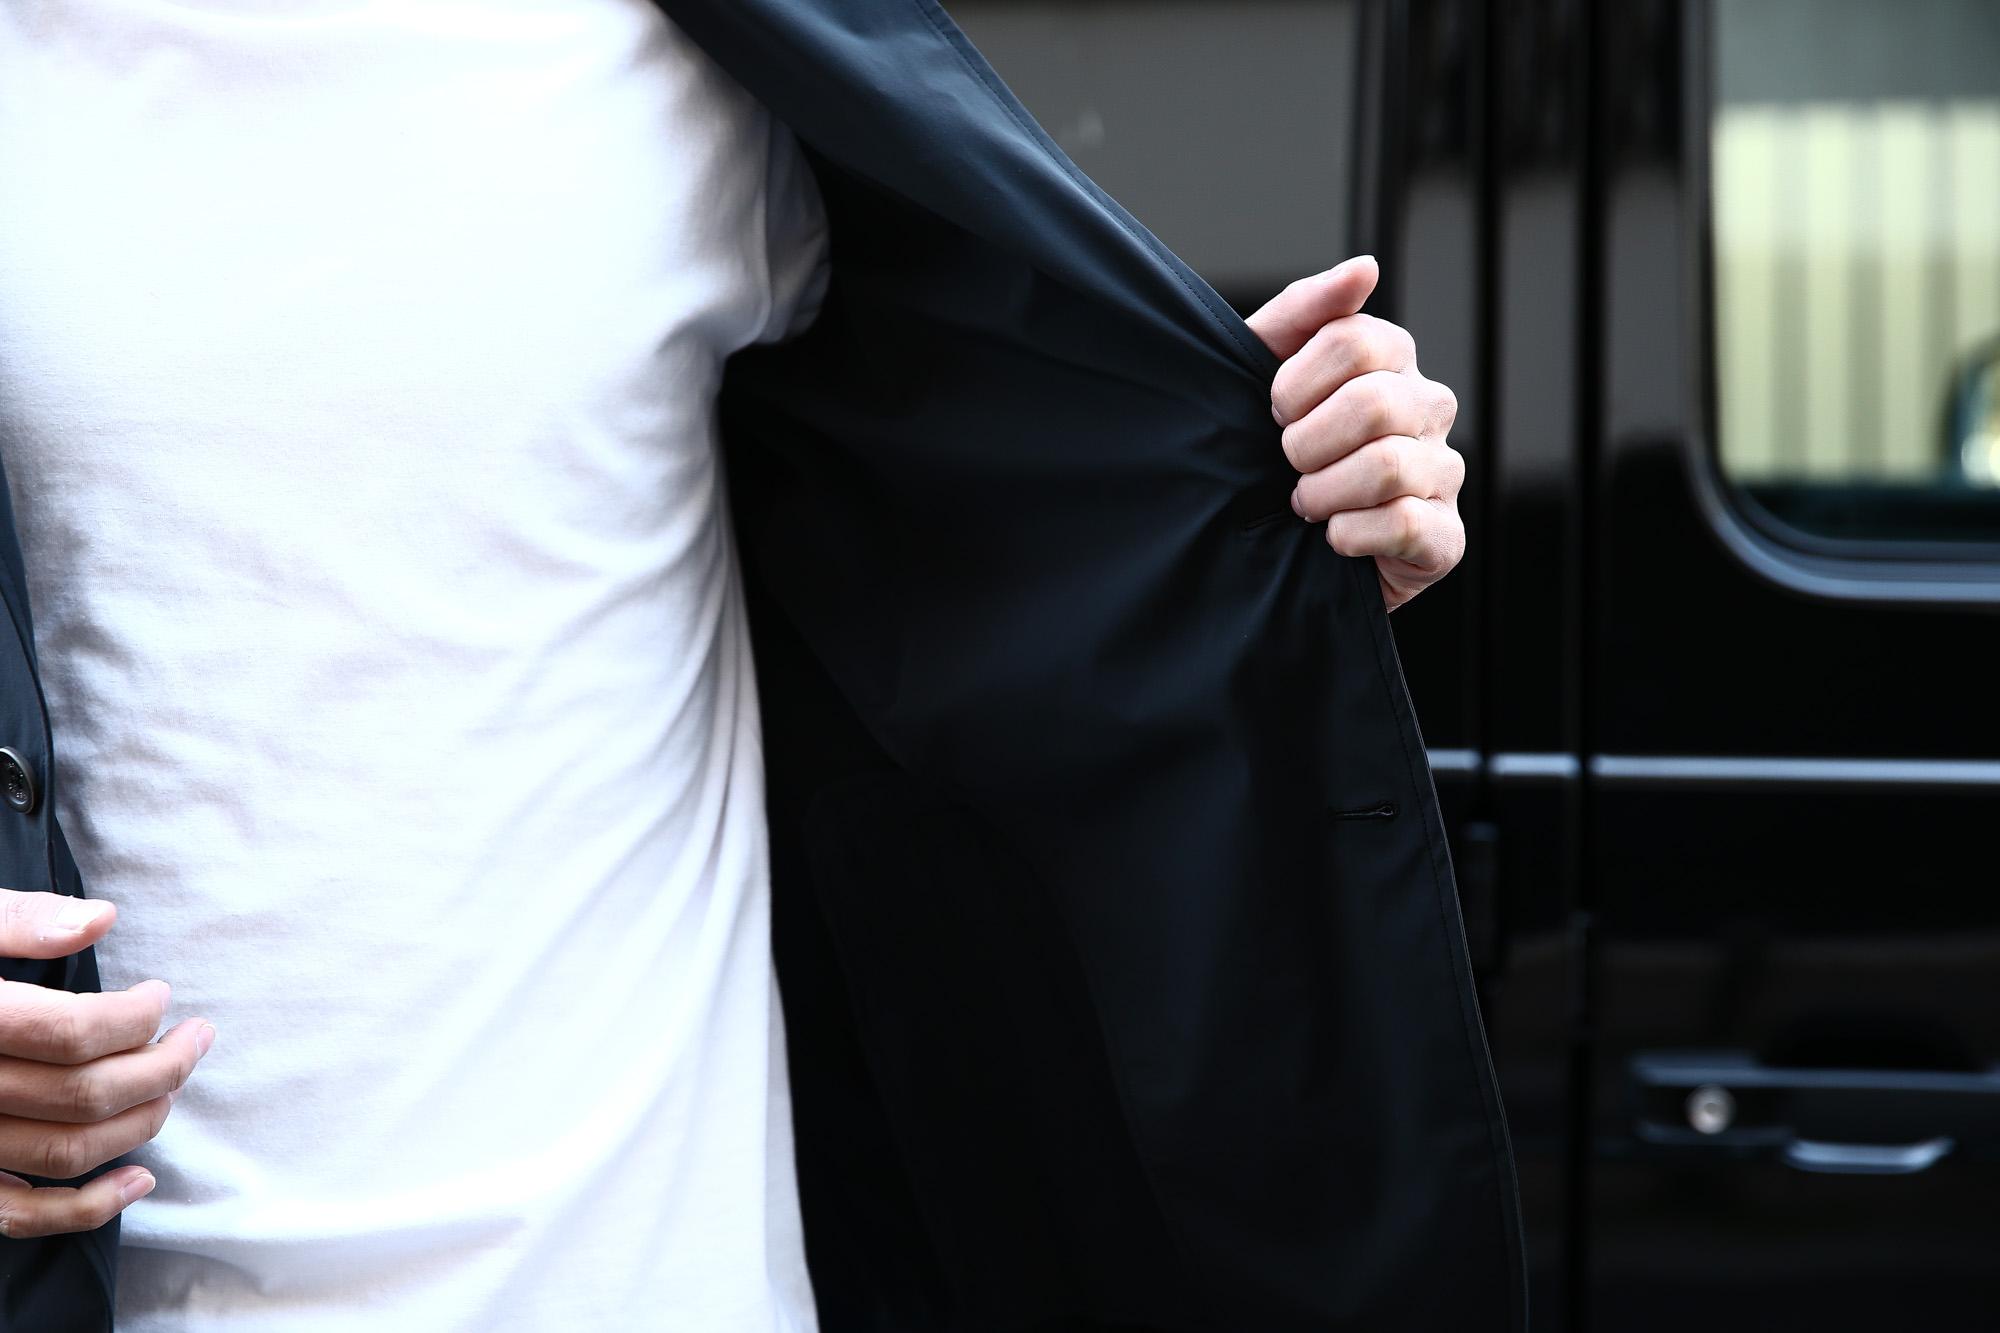 HERNO(ヘルノ) 【GA0069U】 Stretch Nylon Jacket (ストレッチ ナイロン ジャケット) 撥水ナイロン 2Bジャケット BLACK (ブラック・9300) Made in italy (イタリア製) 2018 春夏新作 愛知 名古屋 herno ヘルノ ZODIAC ゾディアック 42,44,46,48,50,52,54